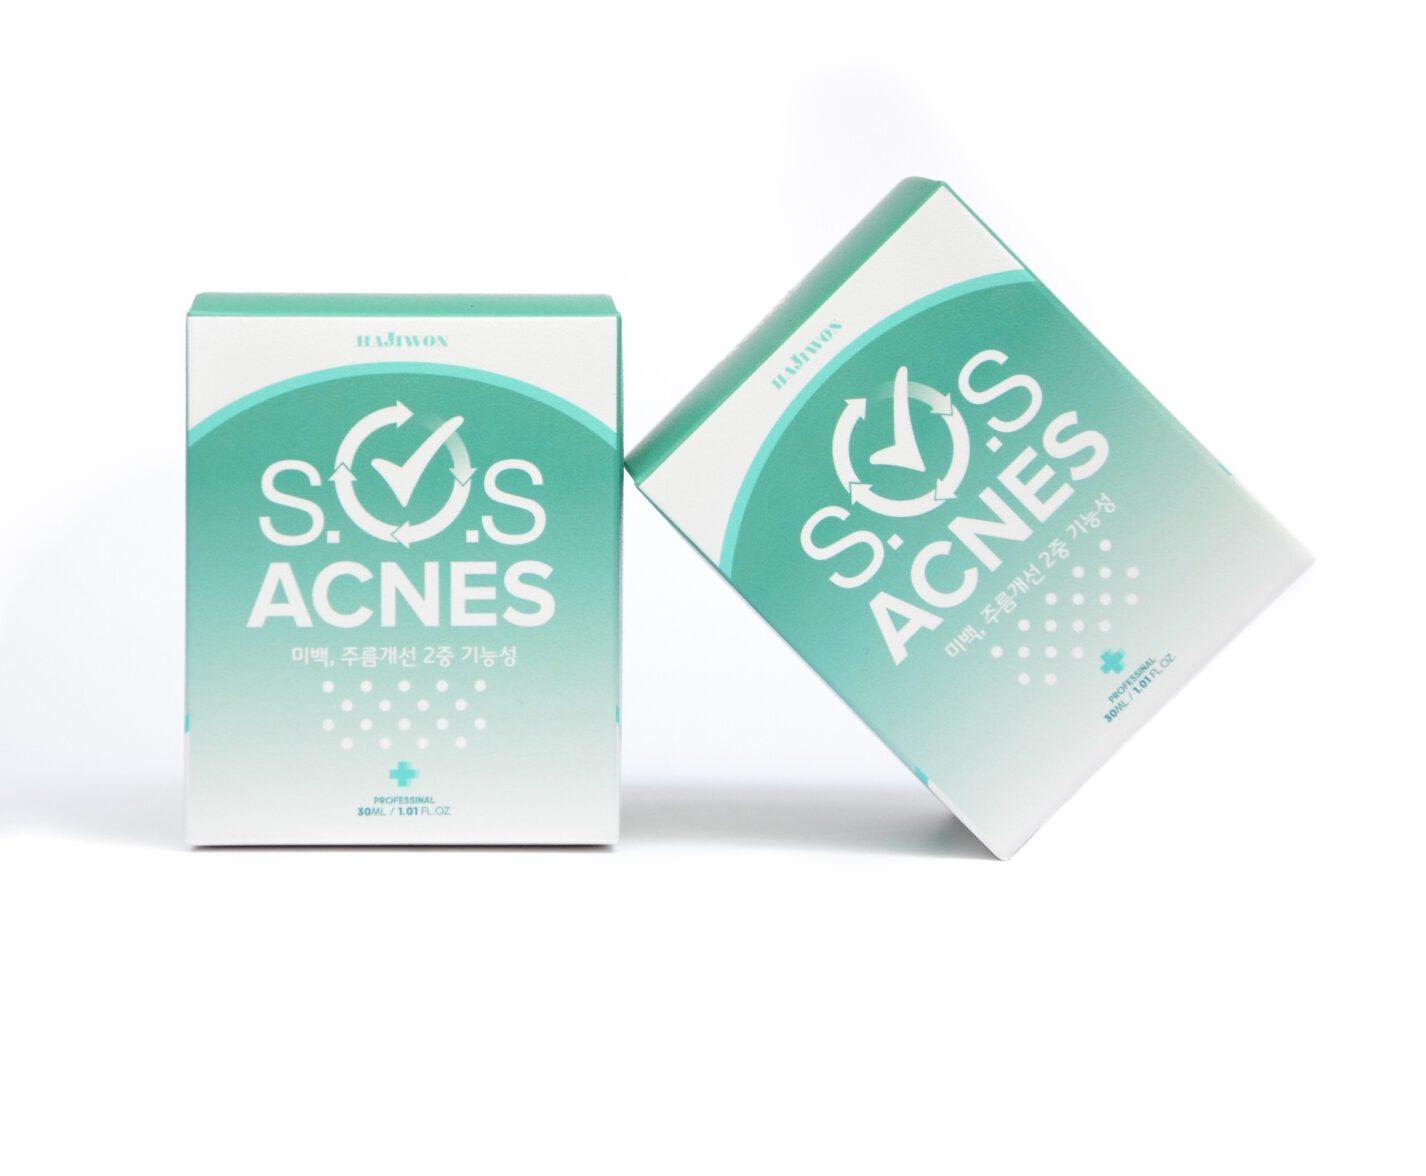 KEM TRỊ MỤN S.O.S ACNES